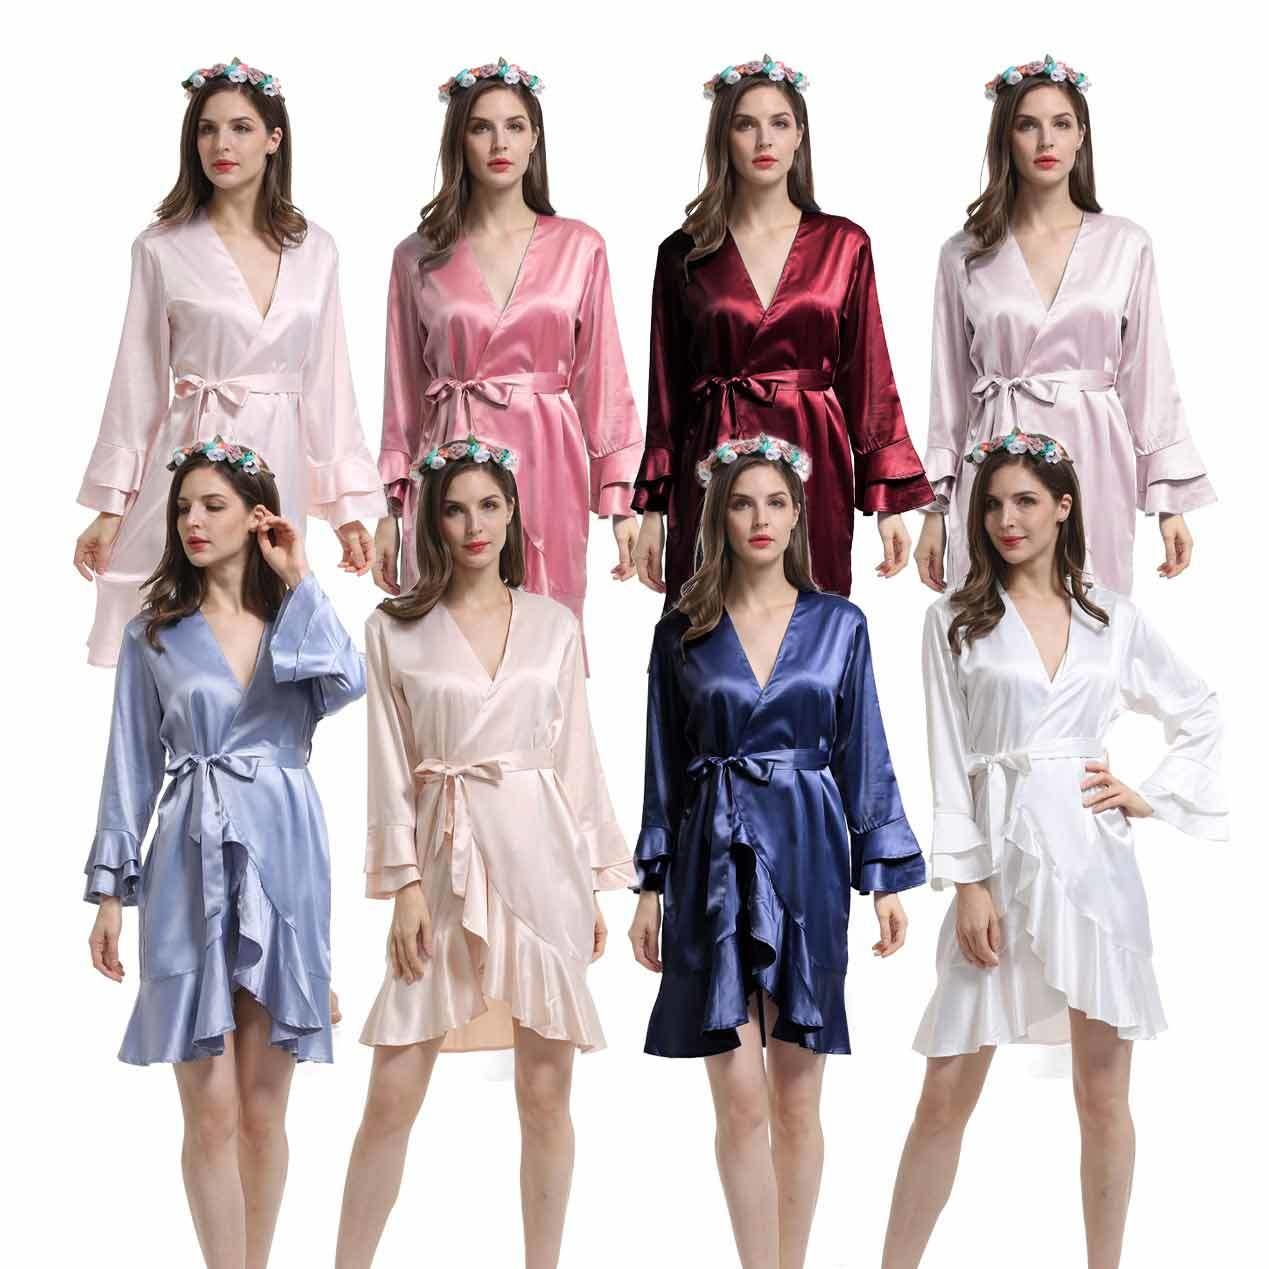 China Style No E9000 Women Plain Matte Silky Satin Ruffled Wedding Bridal Bridesmaid Robes With Matching Color Belt China Bridesmaid Robes And Satin Robes Price